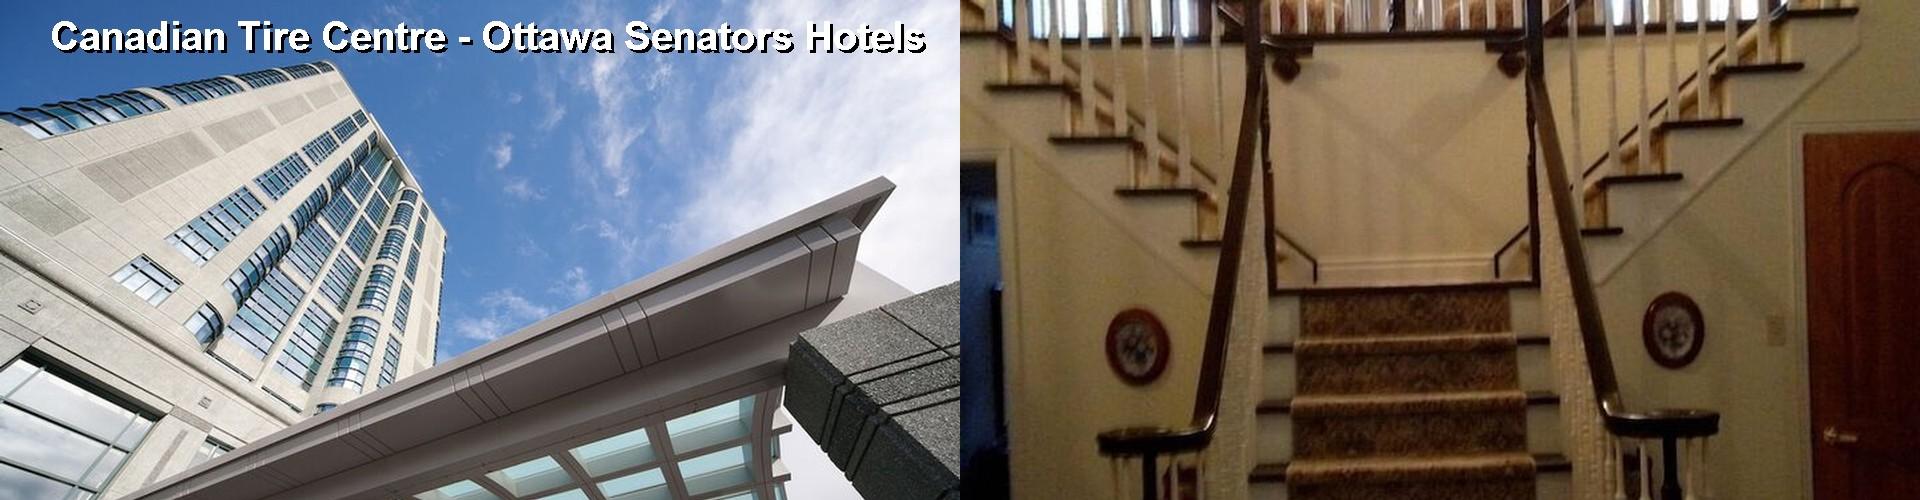 Closest Hotels Near Canadian Tire Centre Ottawa Senators In Kanata On